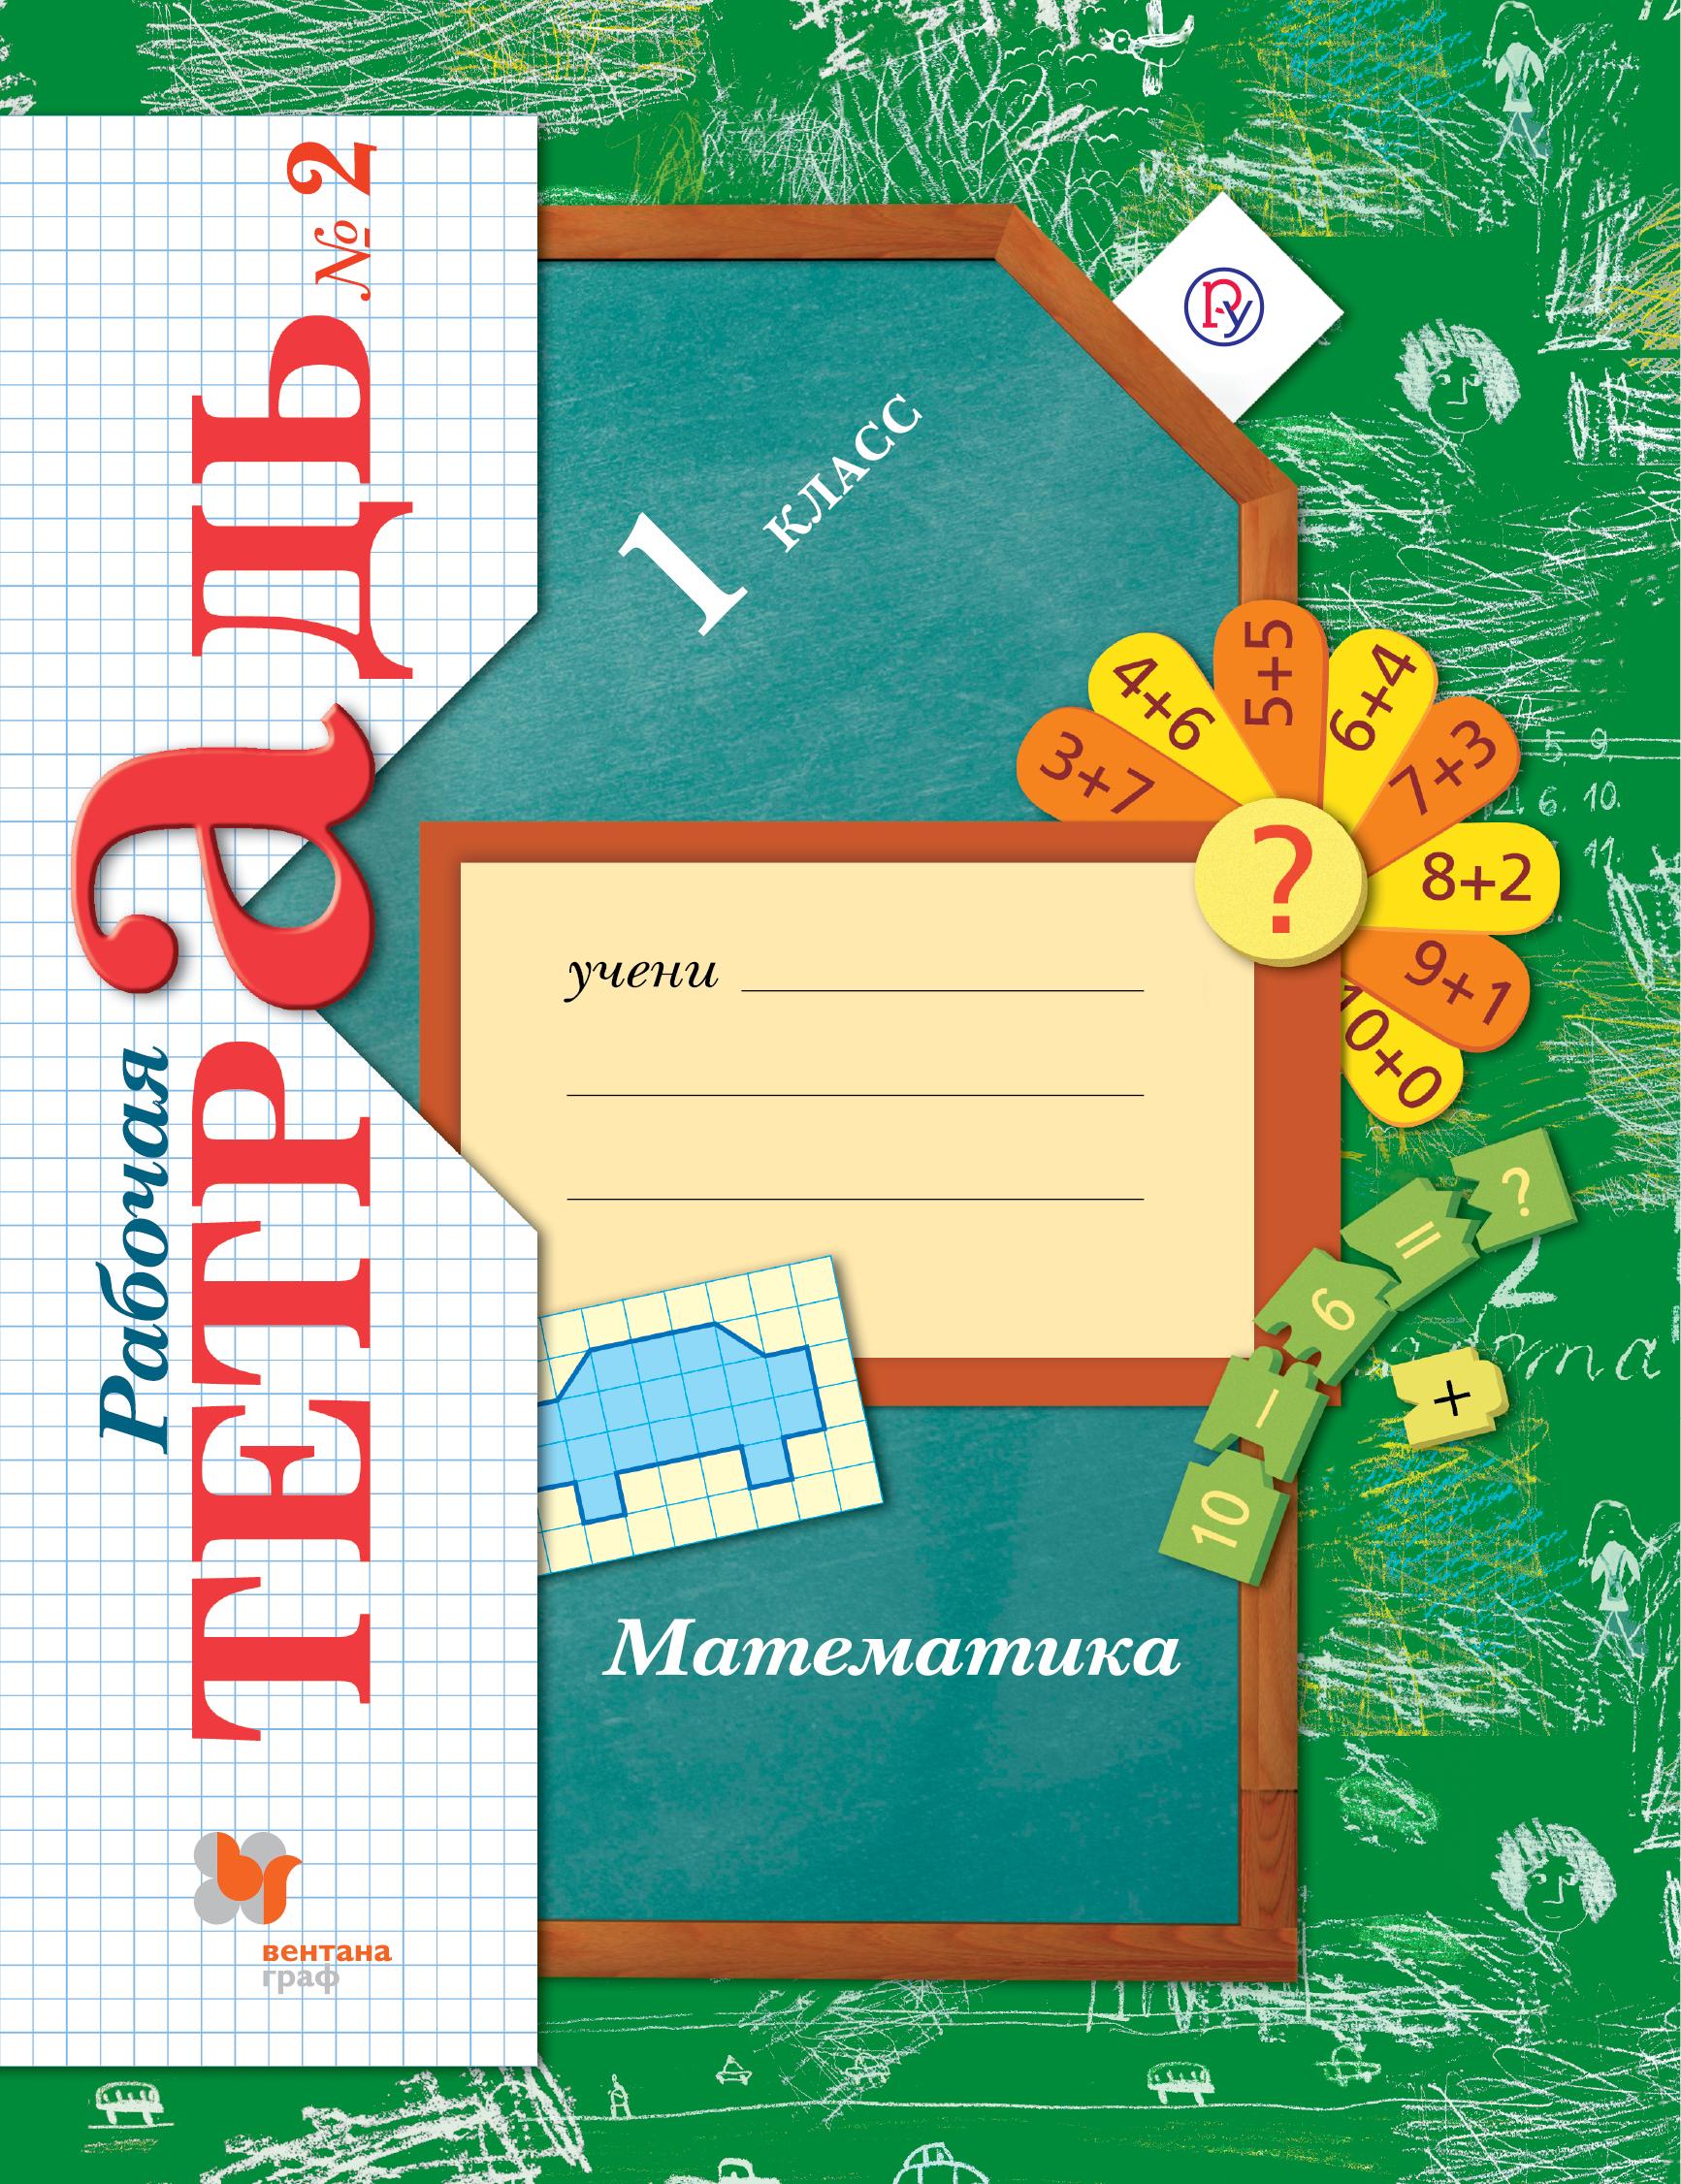 Кочурова Е.Э. Математика. 1 класс. Рабочая тетрадь № 2 математика 6 класс рабочая тетрадь